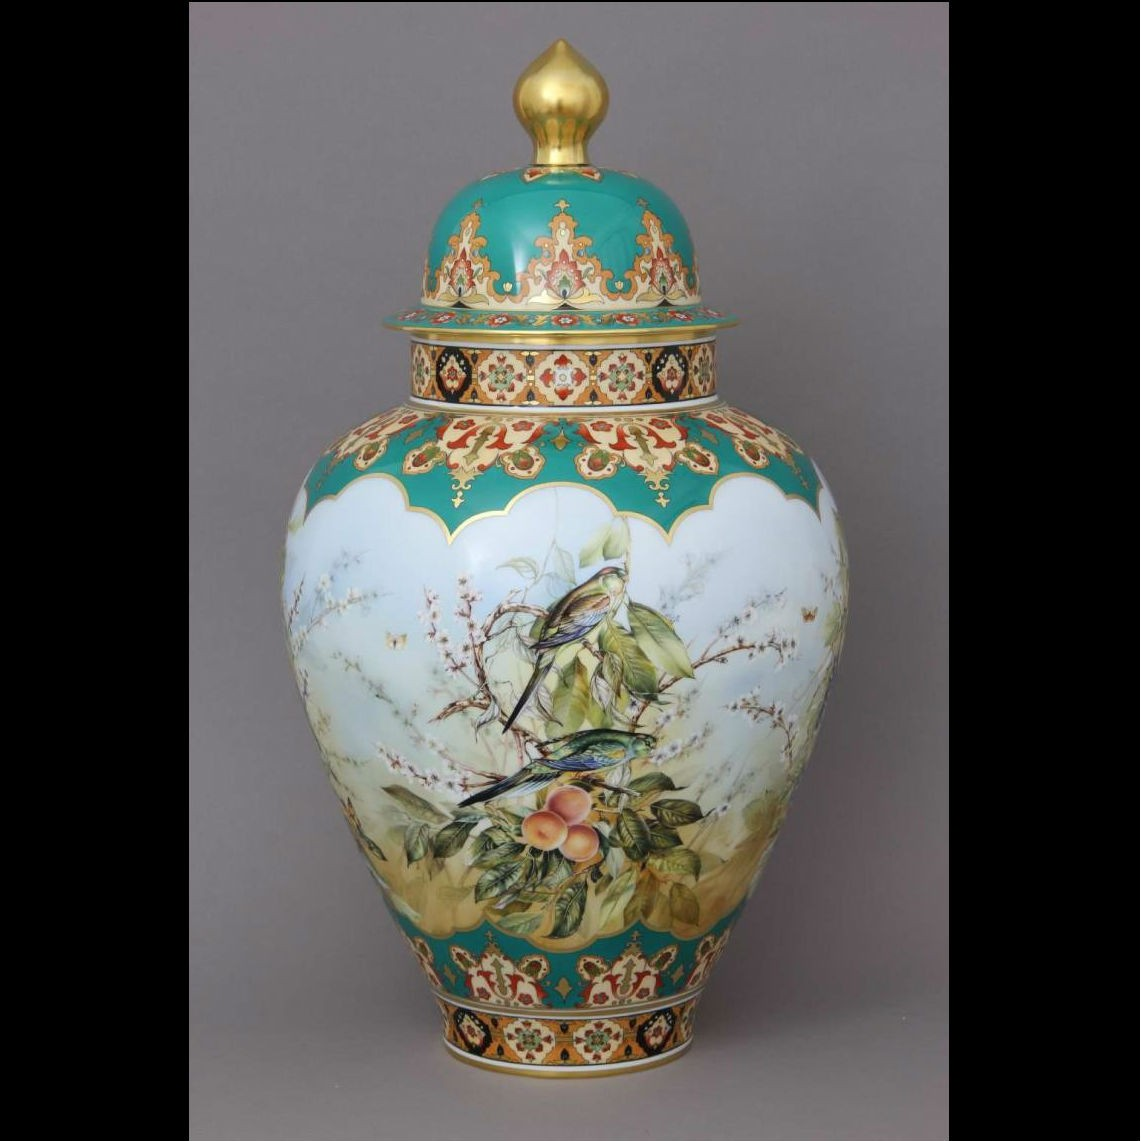 Vase, button knob - Limited to 51 pcs.